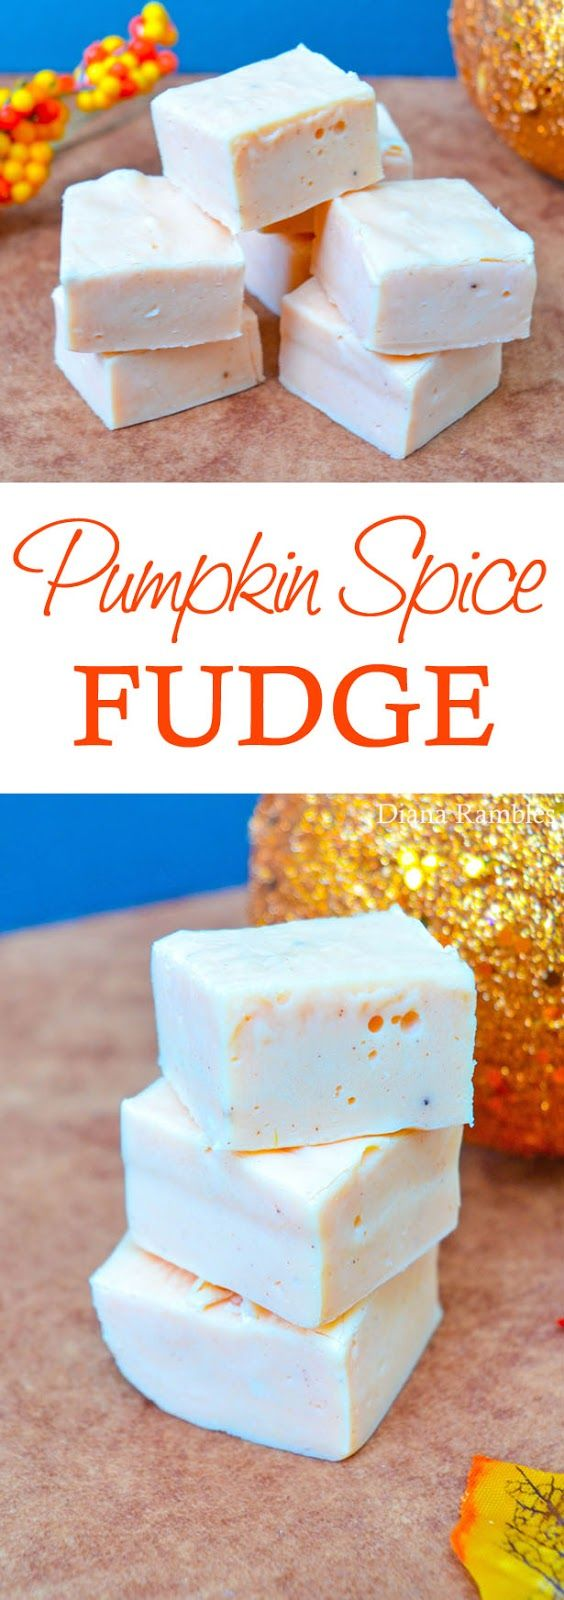 Pumpkin Spice Microwave Fudge #easyrecipe